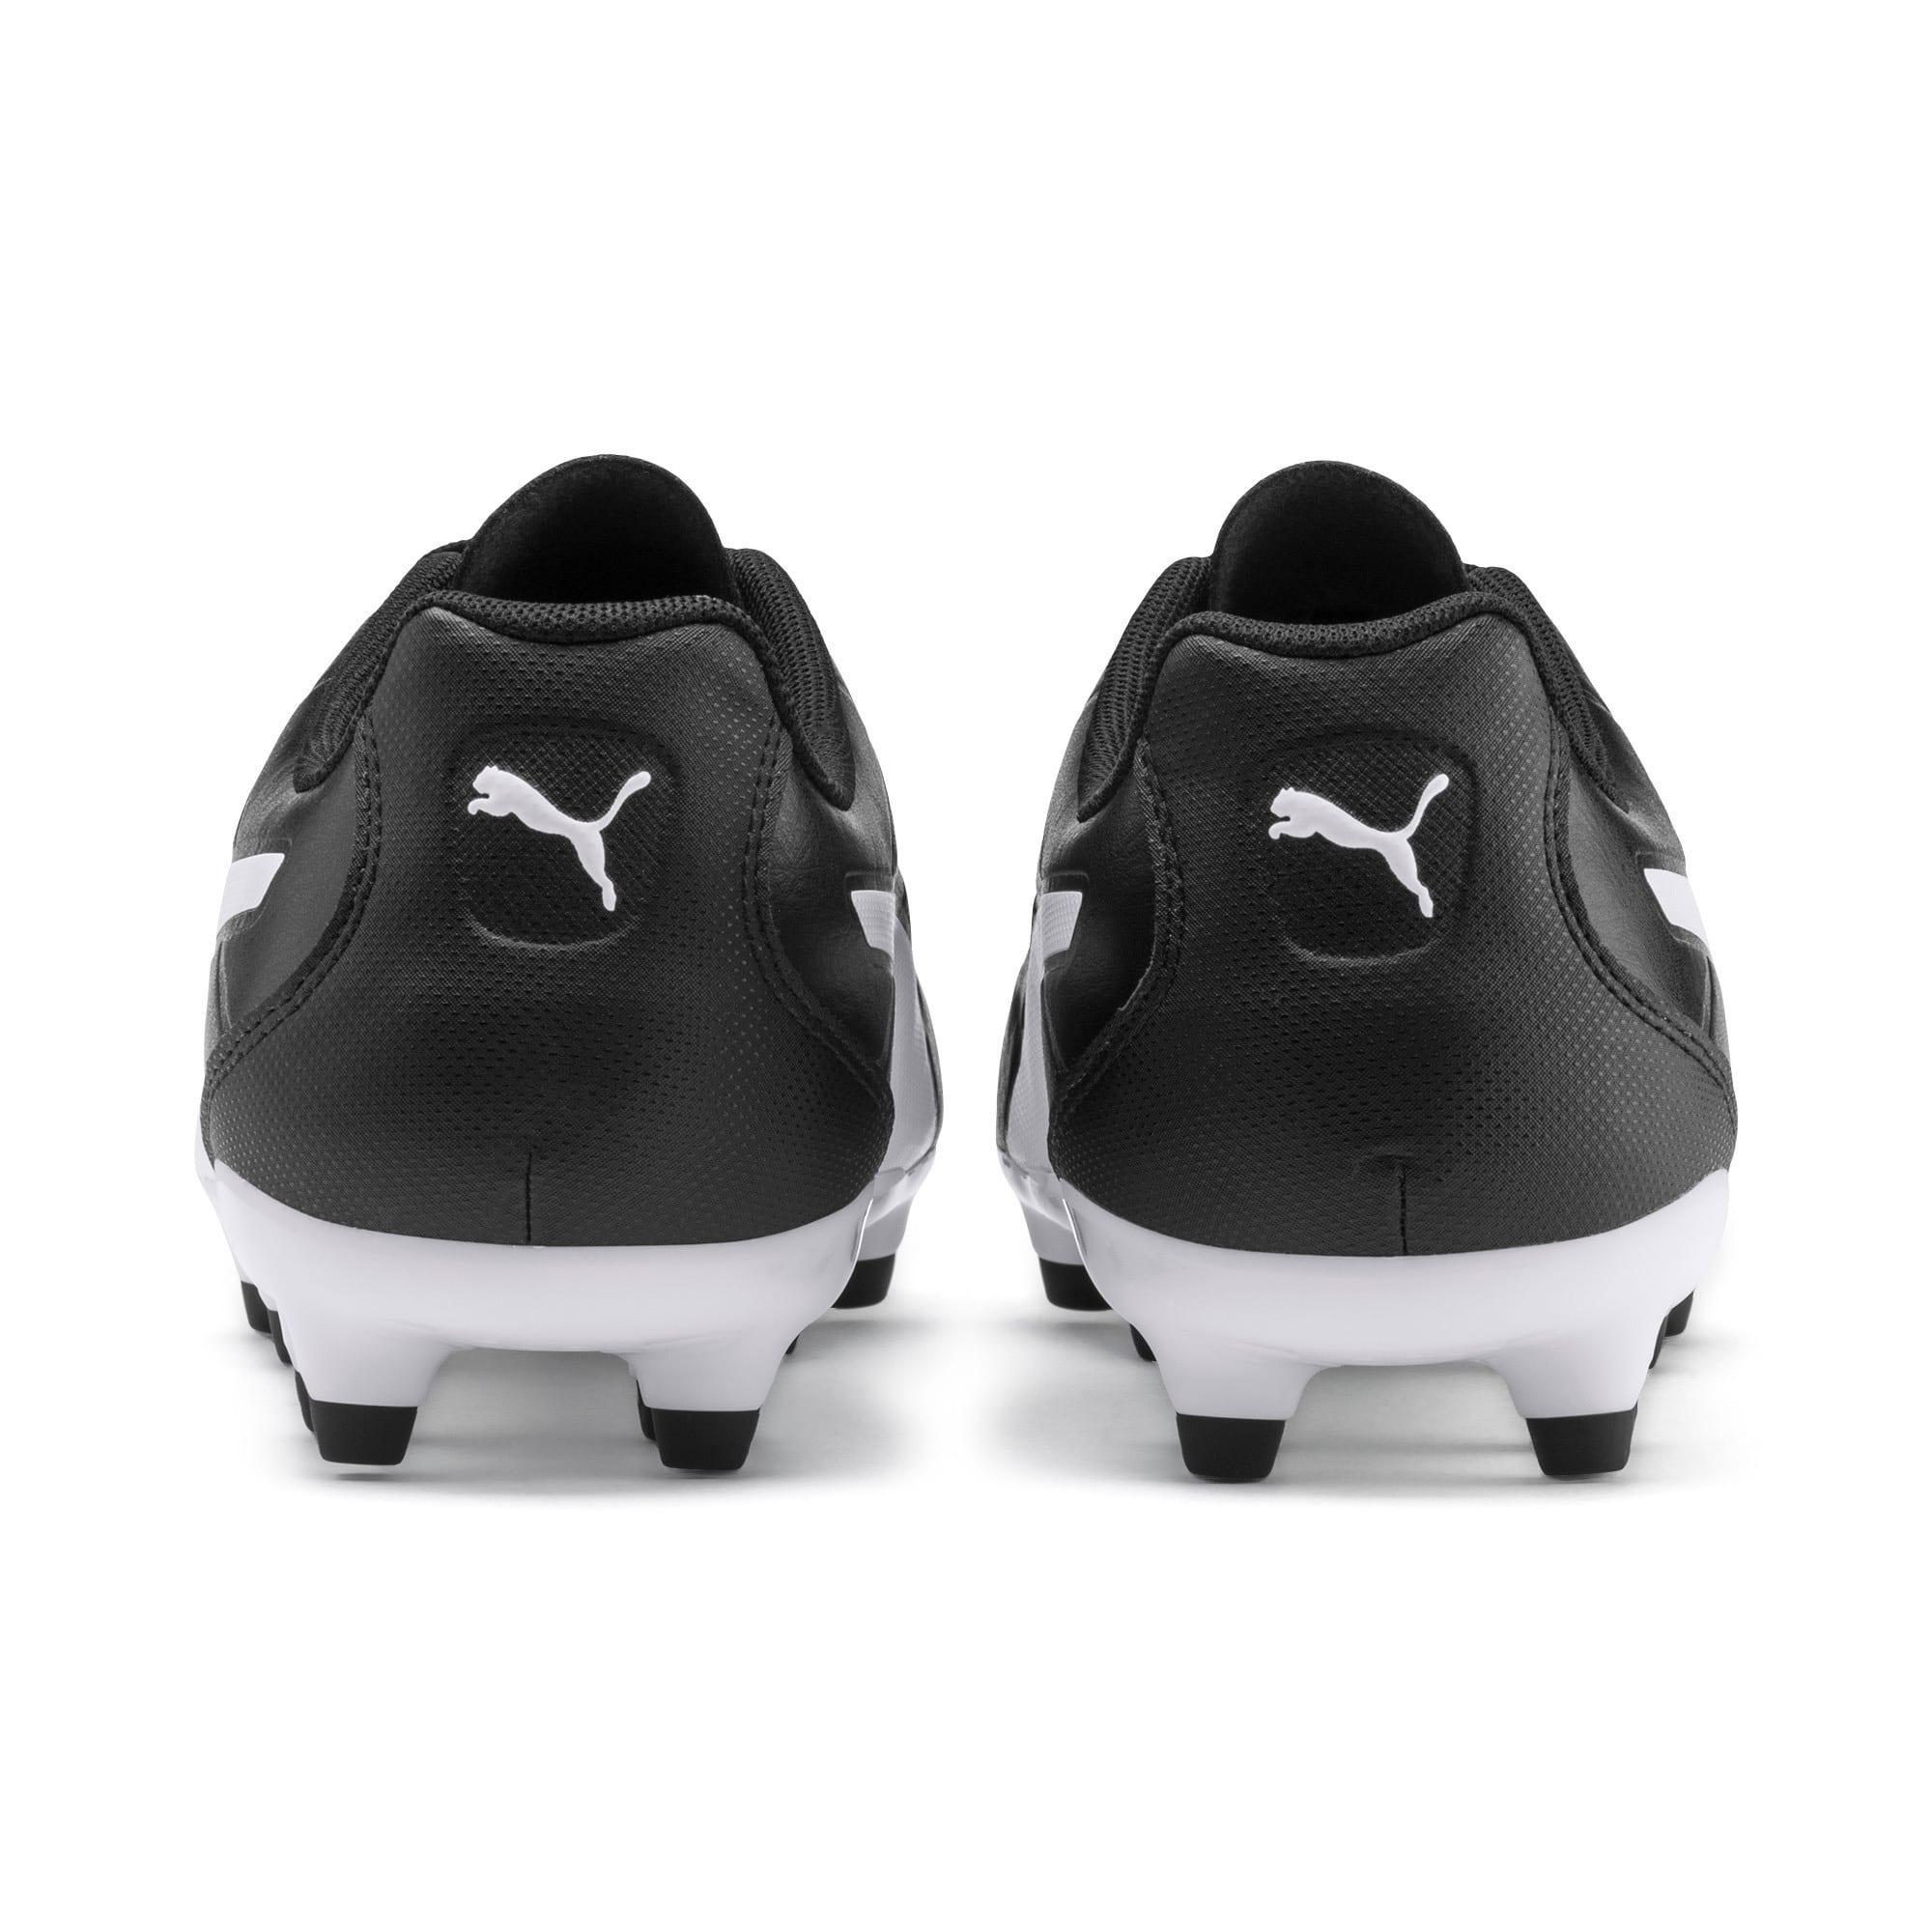 Thumbnail 5 of Monarch FG Men's Football Boots, Puma Black-Puma White, medium-IND